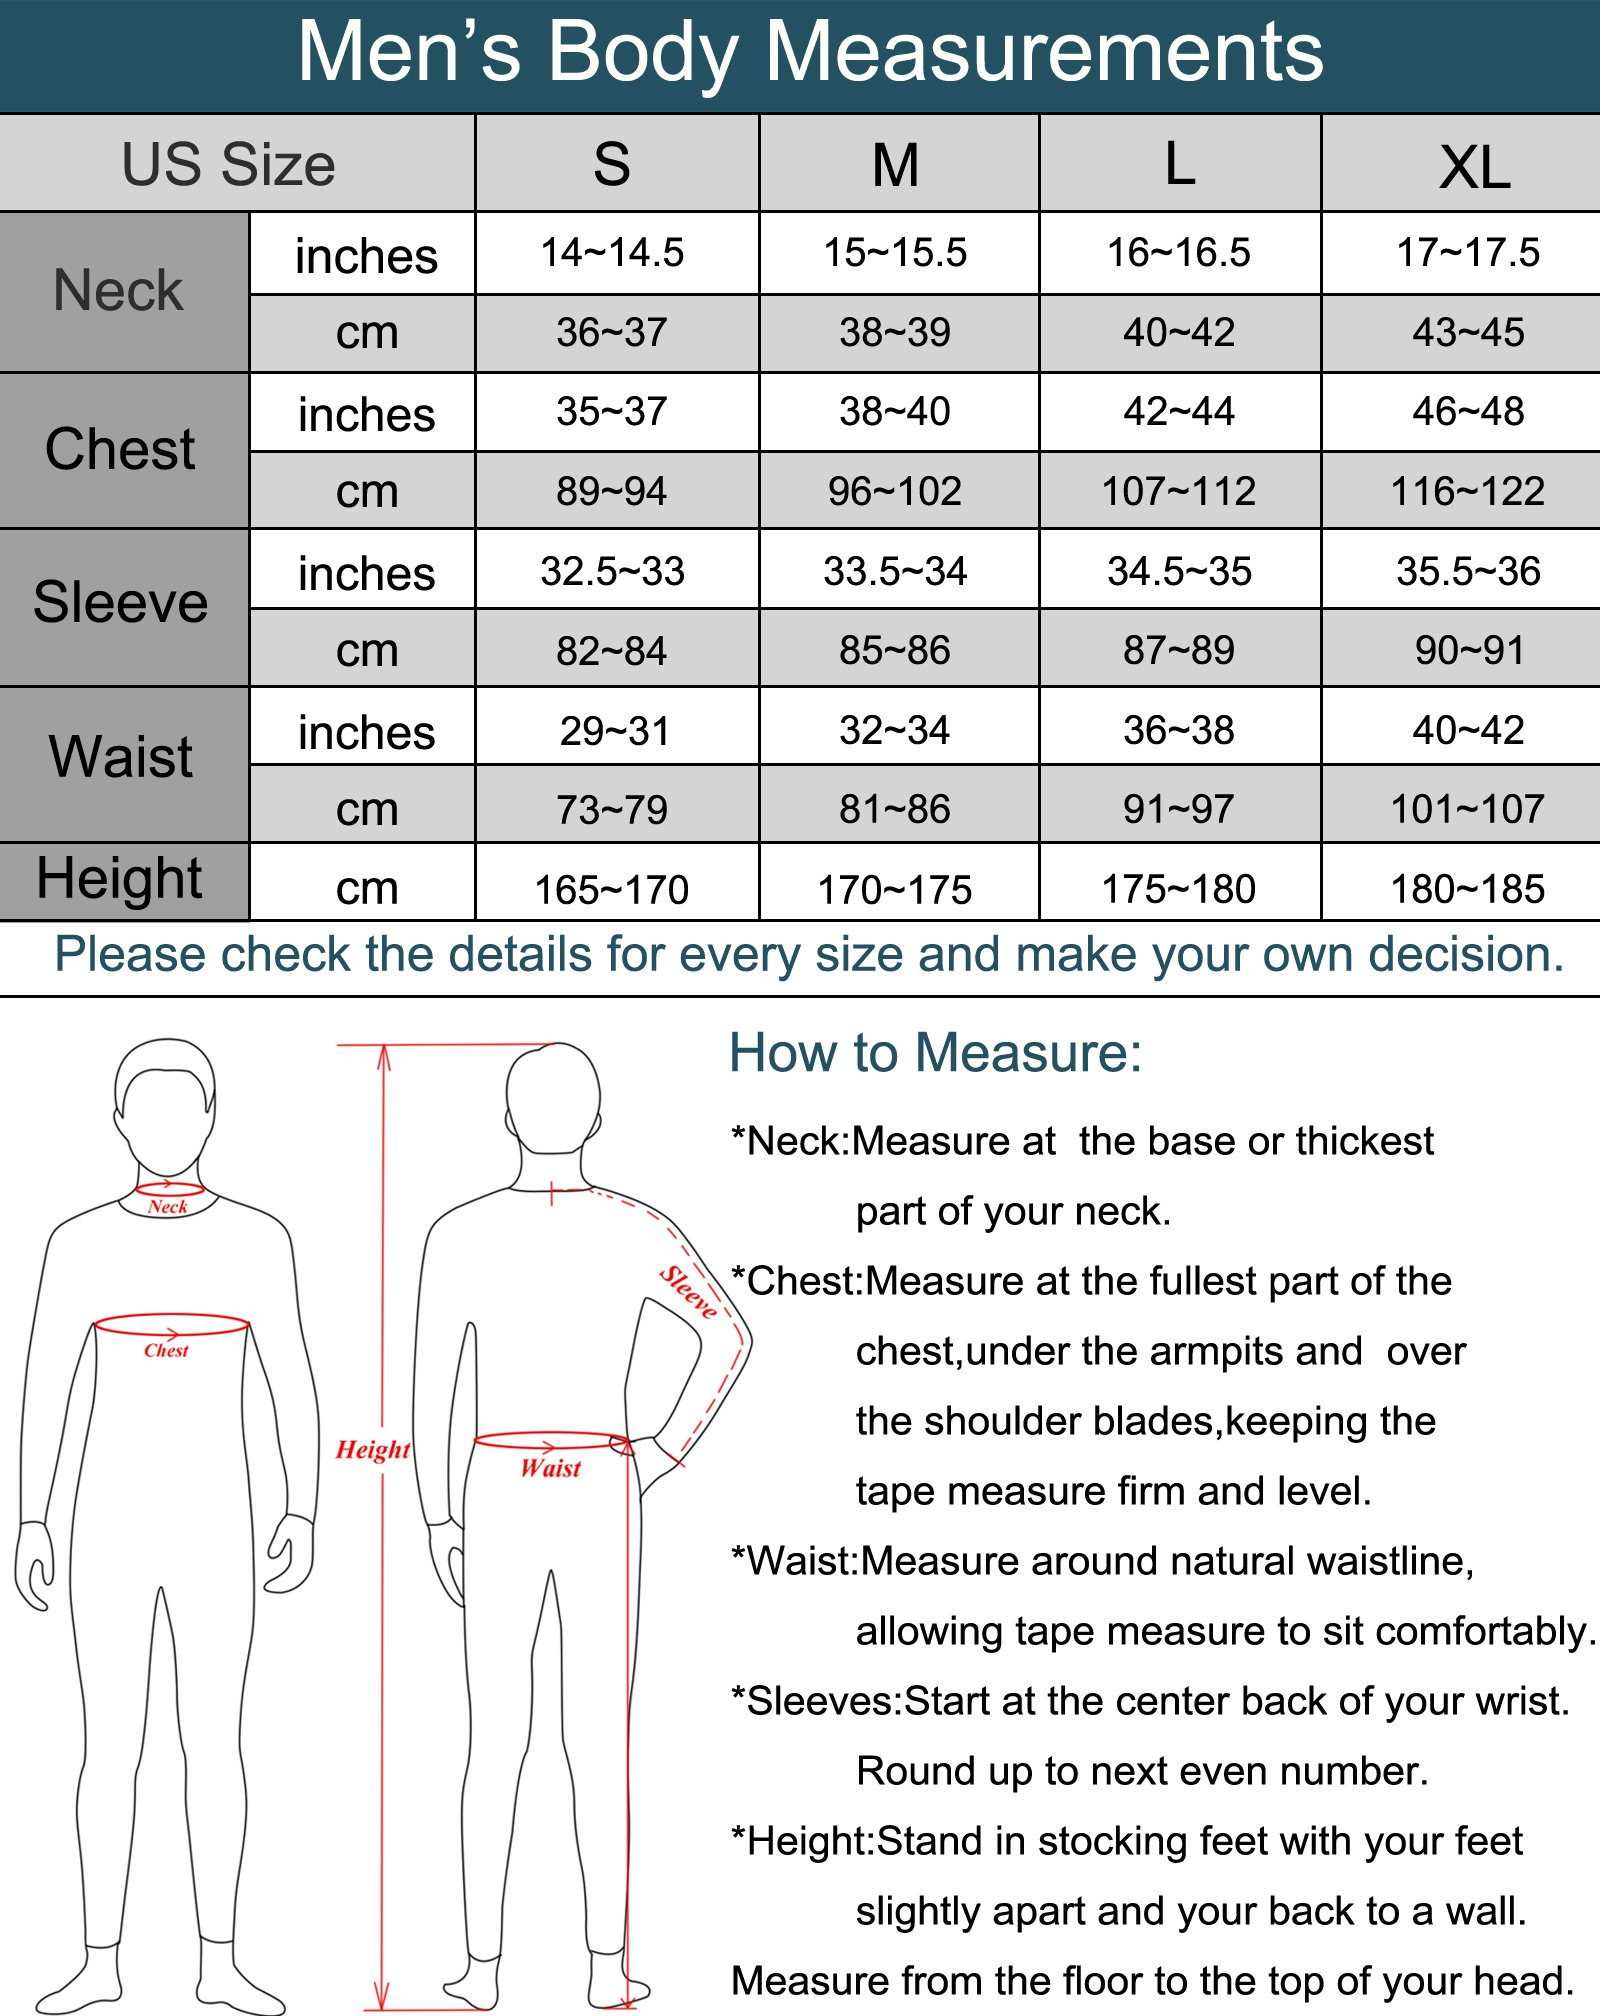 Paul Jones®Men's Shirt Formal Casual Shirt for Men Button Down (M) CL1044-5 Light Blue by Paul Jones®Men's Shirt (Image #5)